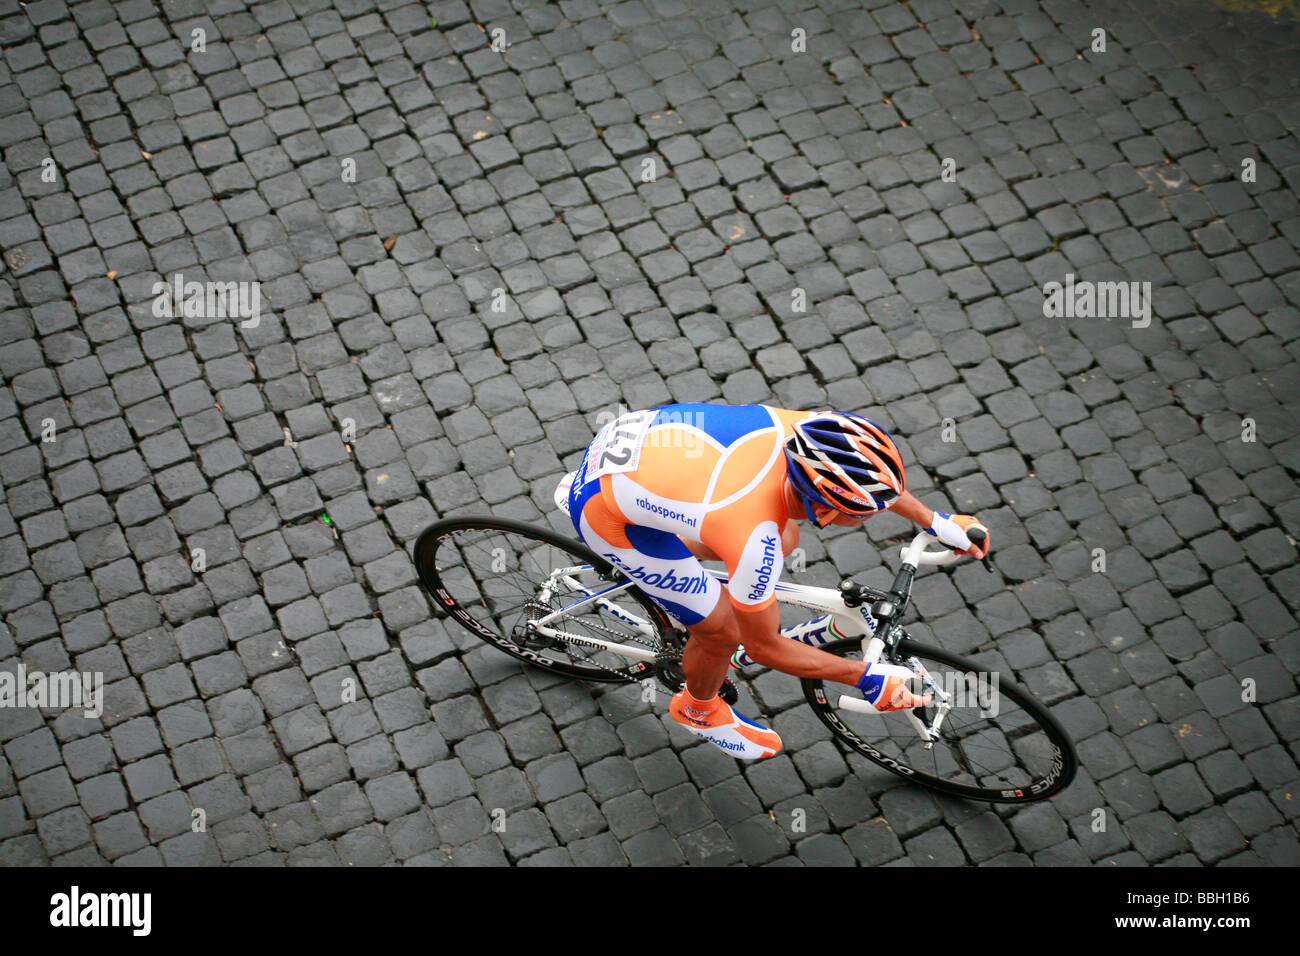 Mauricio Ardila Cano cycling in Tour of Italy cycle bike road race - Stock Image